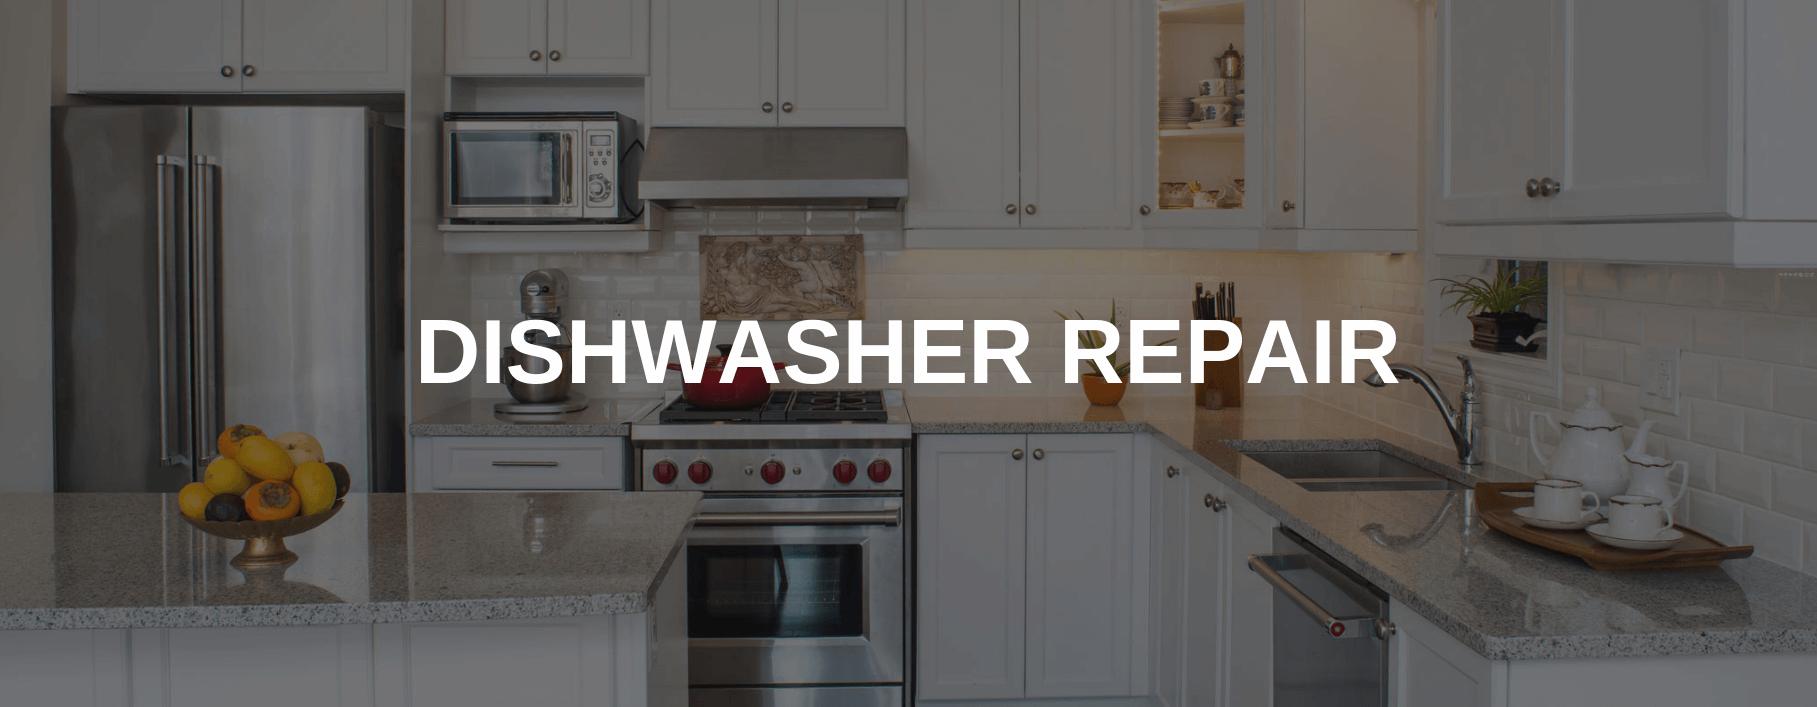 dishwasher repair boulder